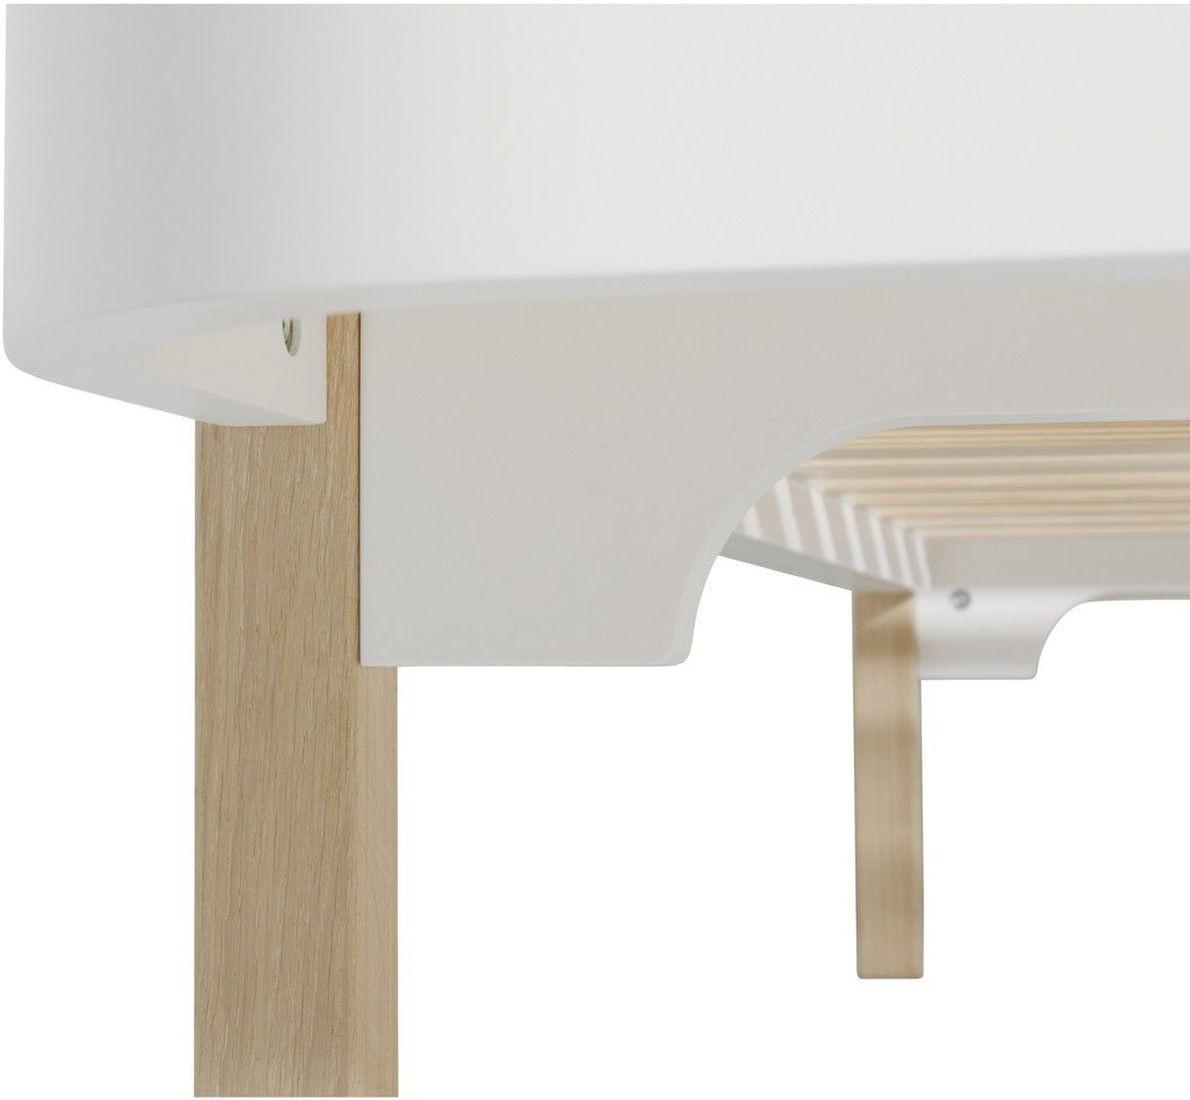 bettsofa tagesbett wood 90x200 cm oliver furniture kleine fabriek. Black Bedroom Furniture Sets. Home Design Ideas